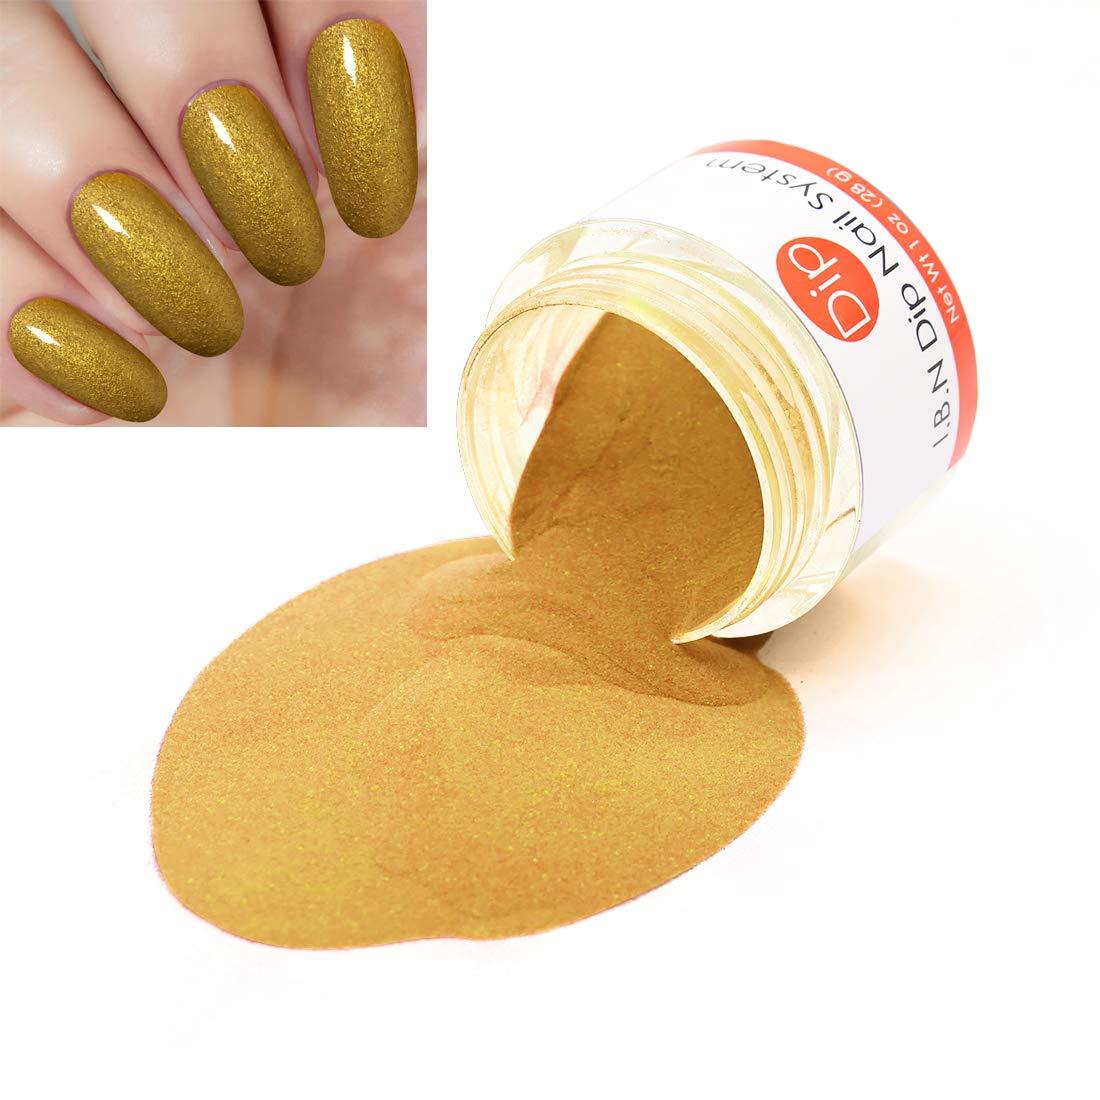 Gold Nail Dipping Powder (Added vitamin) I.B.N Dipped Acrylic Dip Powder DIY Manicure Salon Home Use, 1oz/28g (DIP 059)